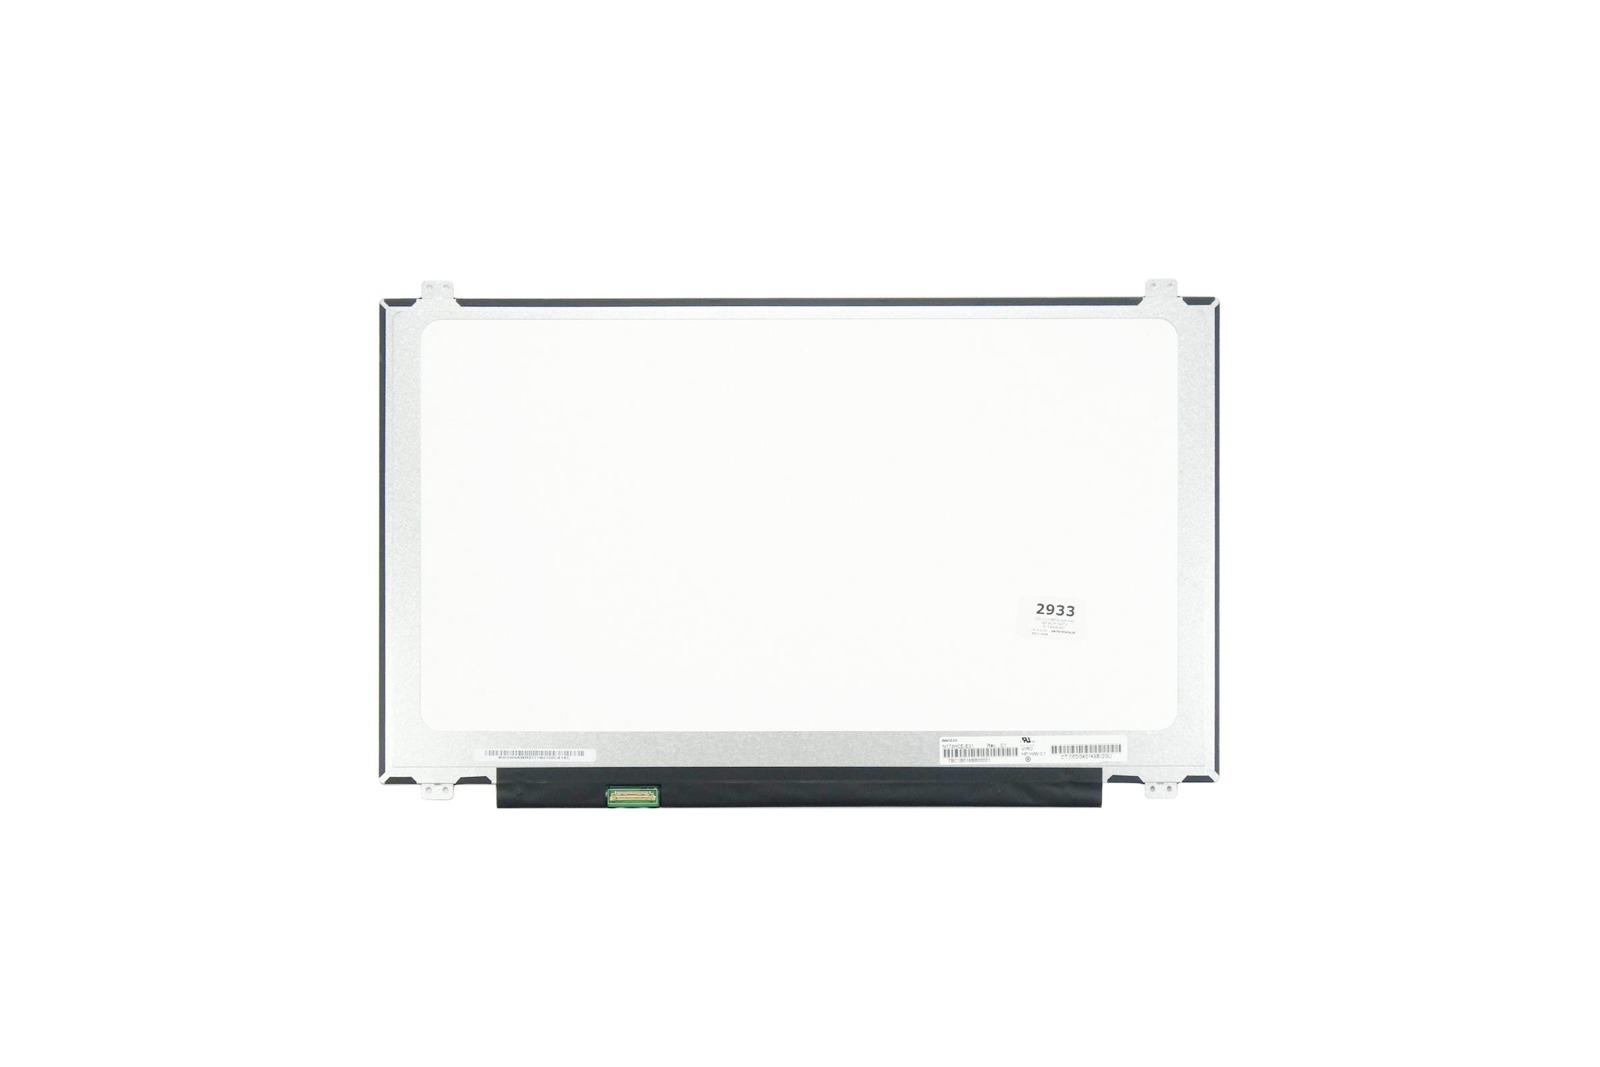 Display Panel Screen Innolux N173hce E31 17 3 Fhd Tn